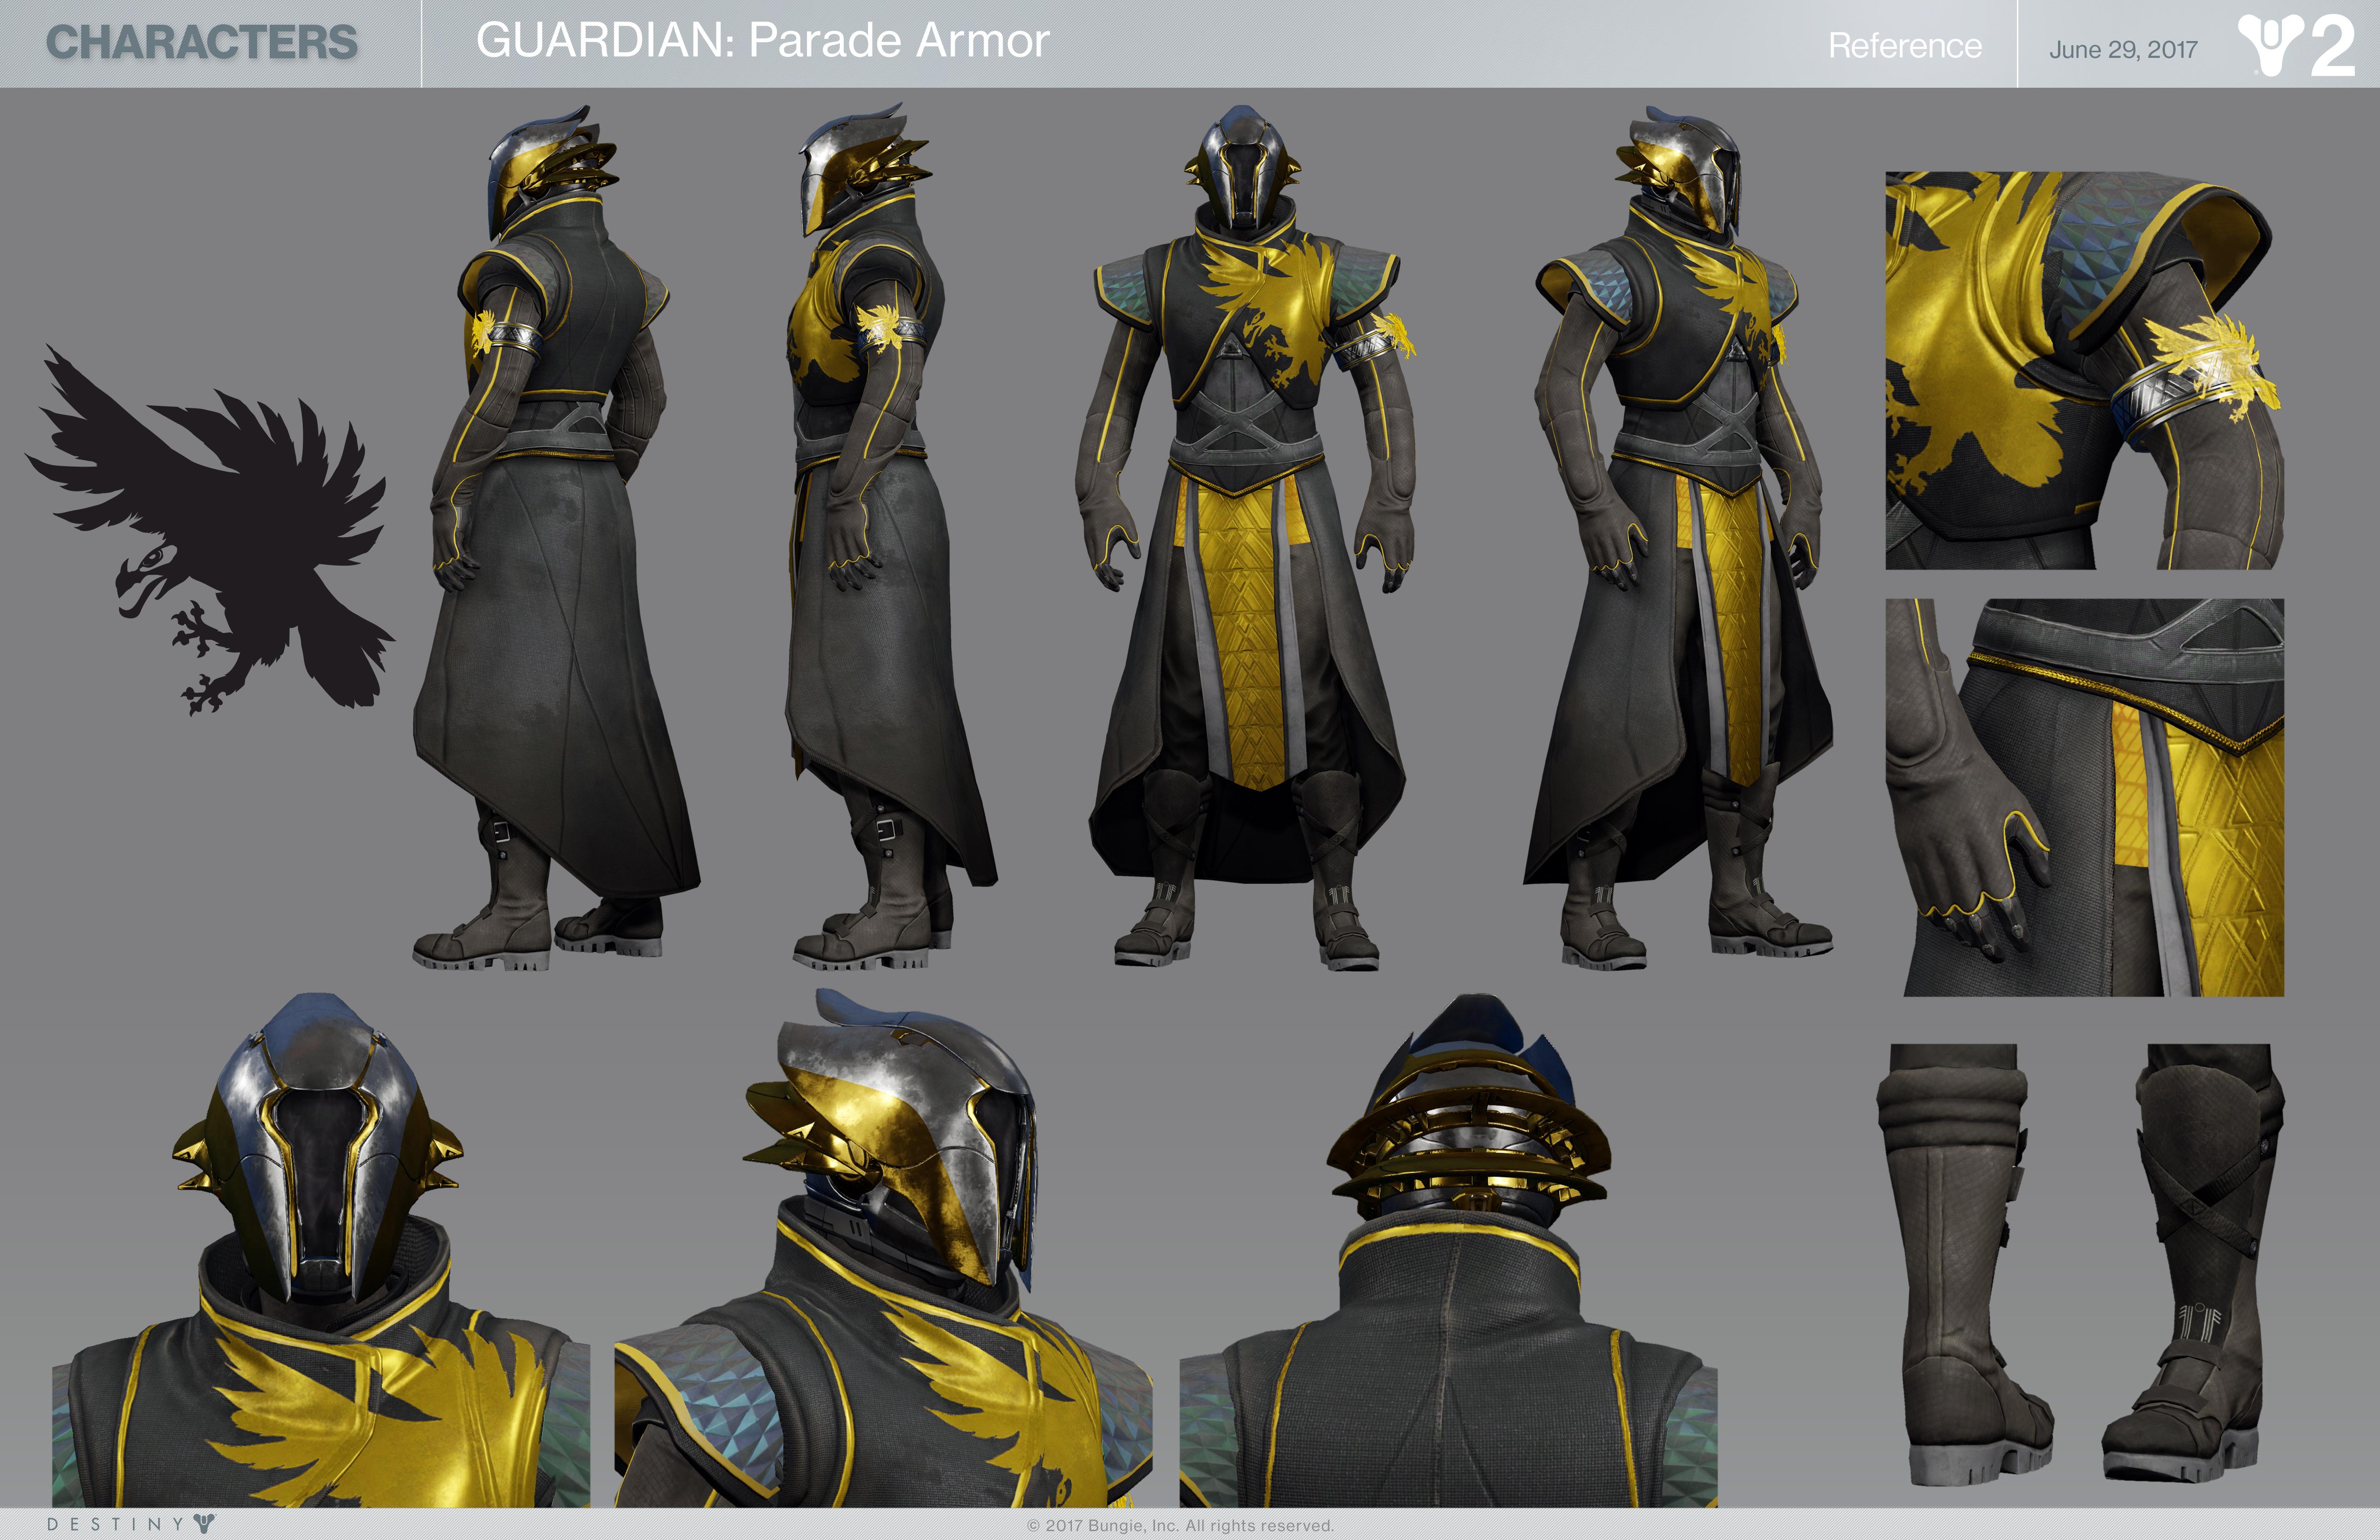 Destiny 2 Warlock Parade Armor Character Sheet